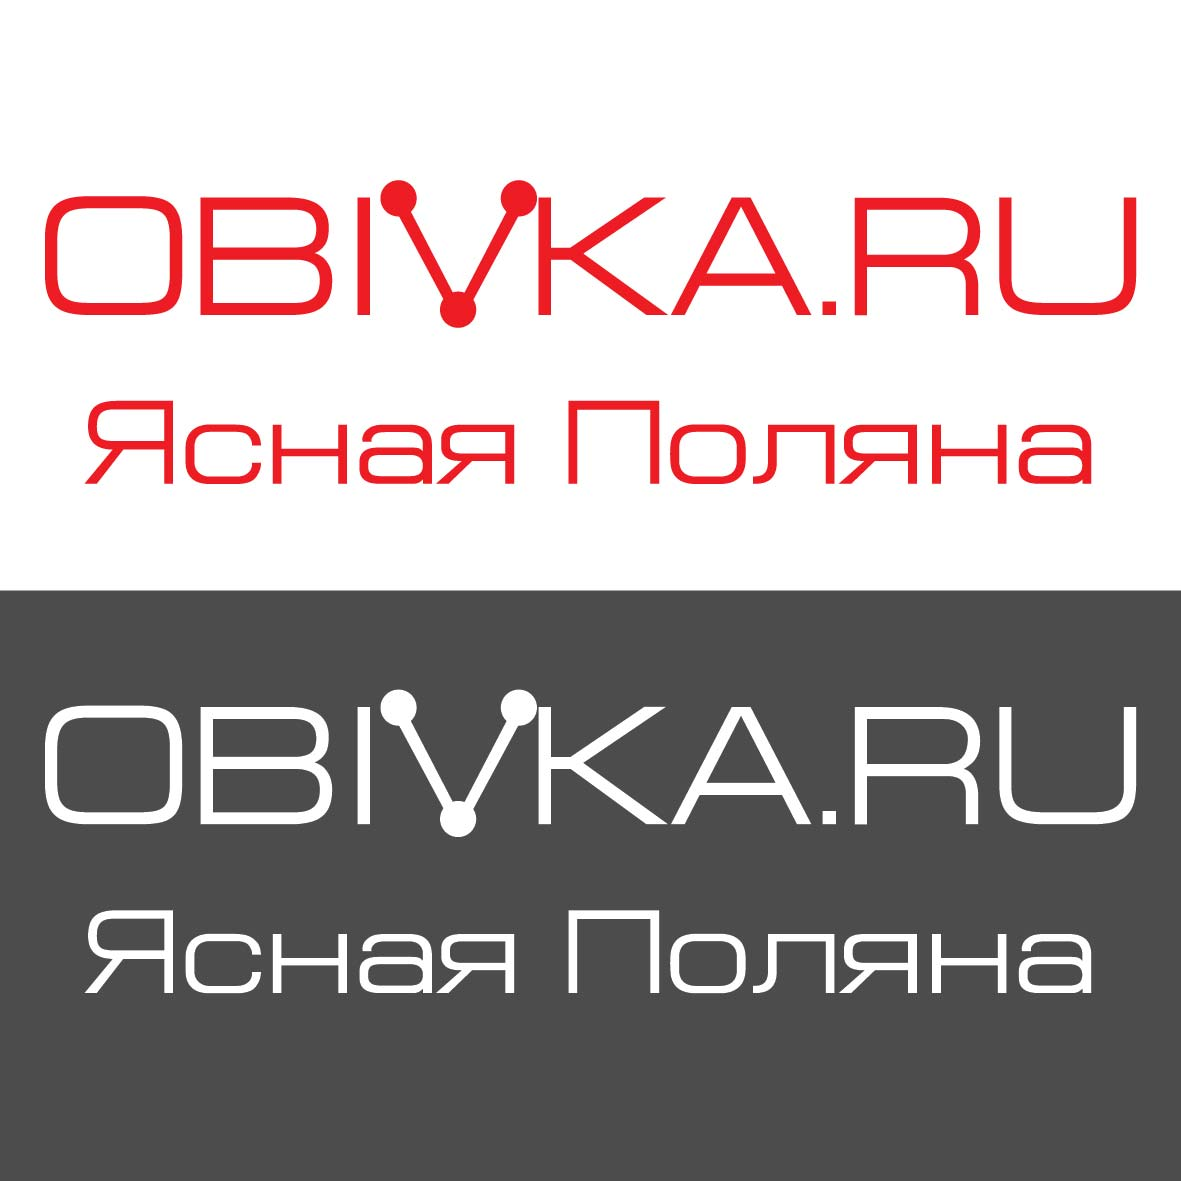 Логотип для сайта OBIVKA.RU фото f_7005c10fdc22cc40.jpg